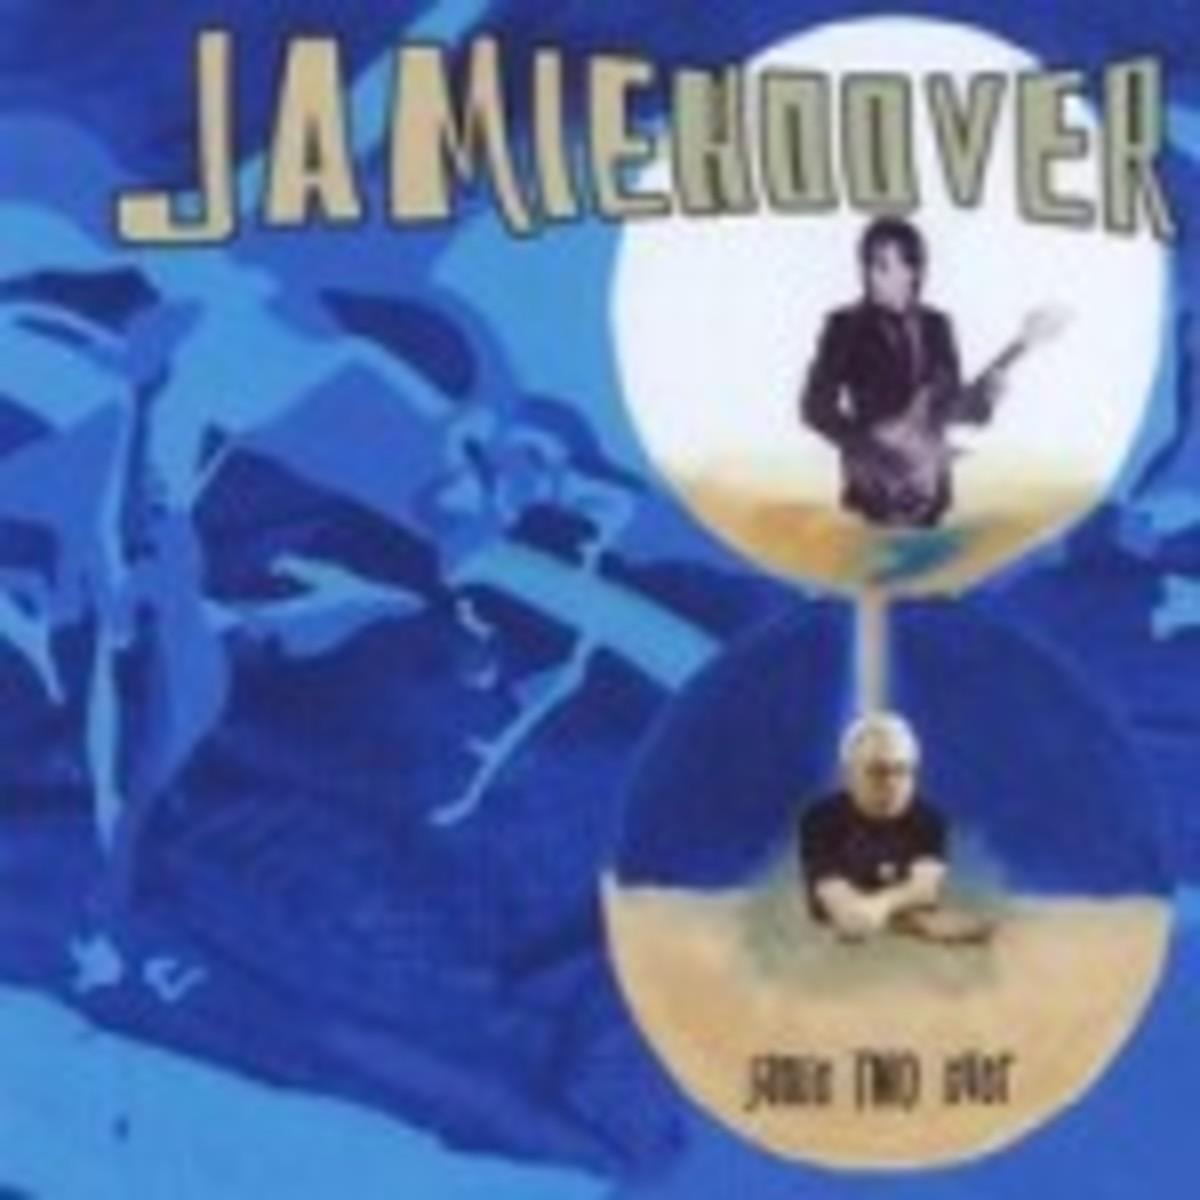 jamiehoover6